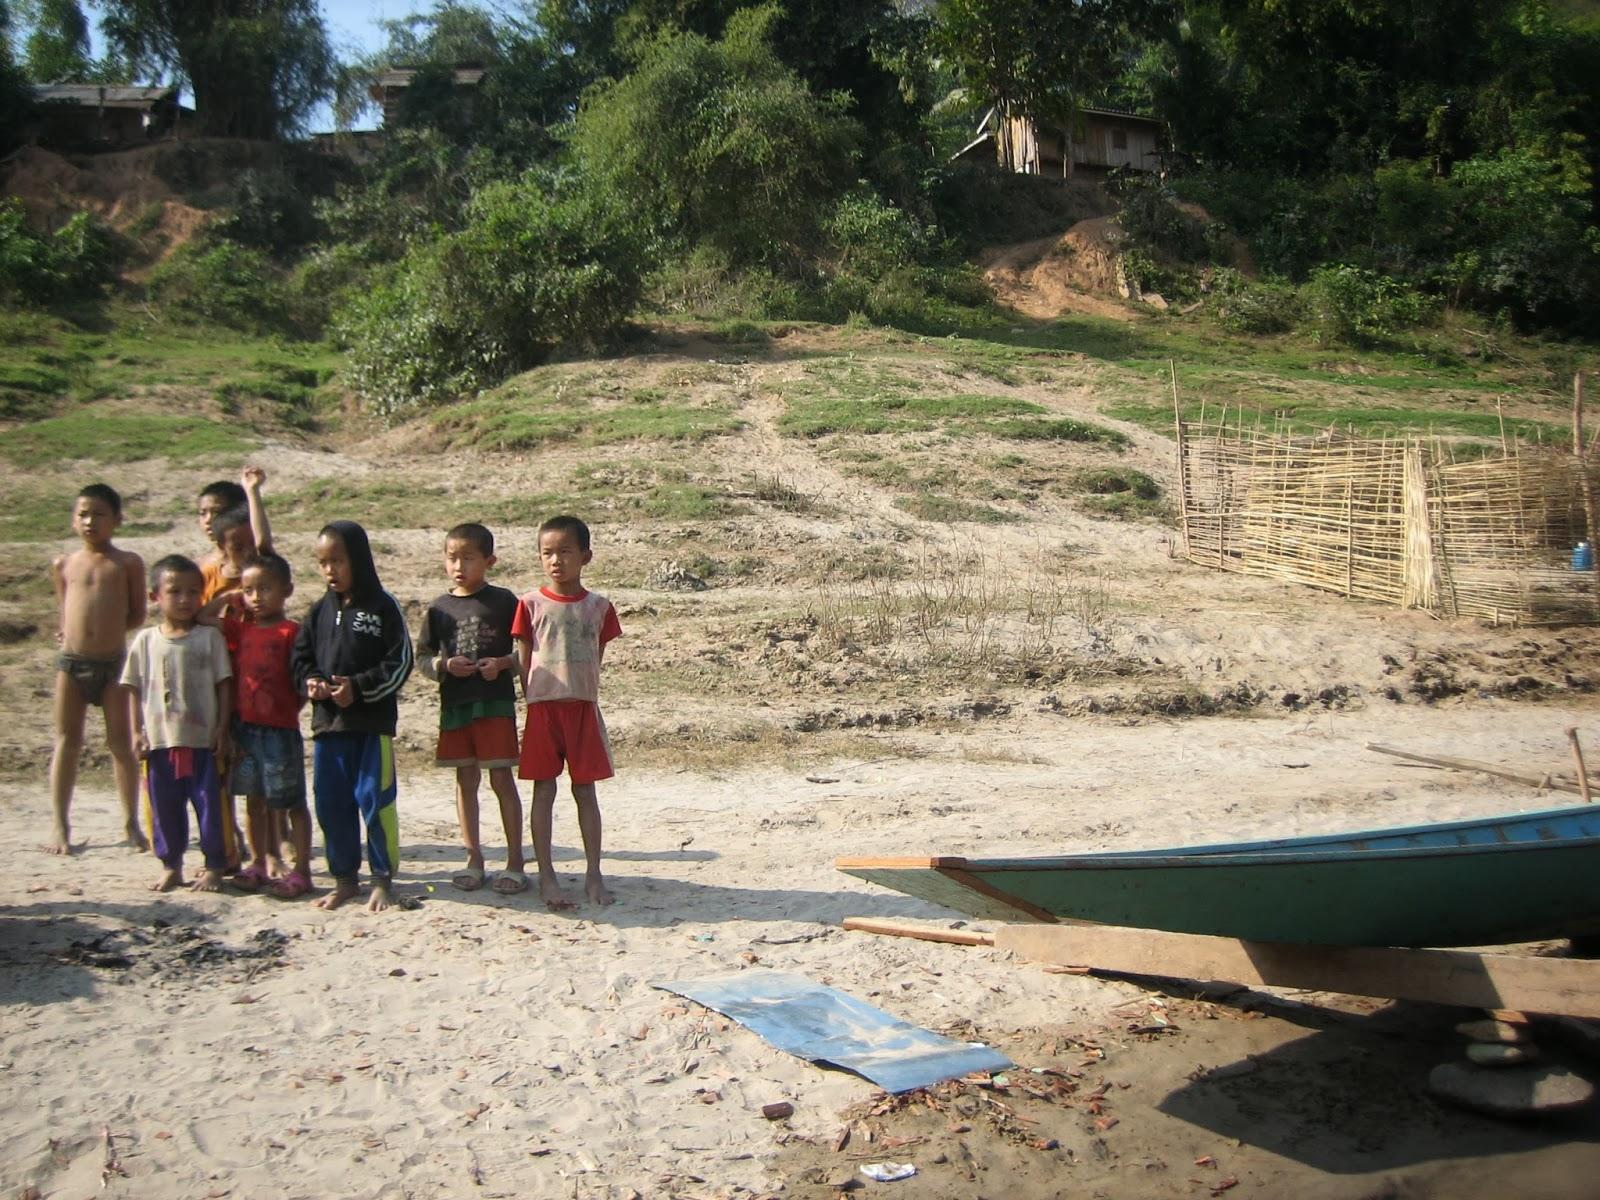 loas-natives-locals-mekong-river-village